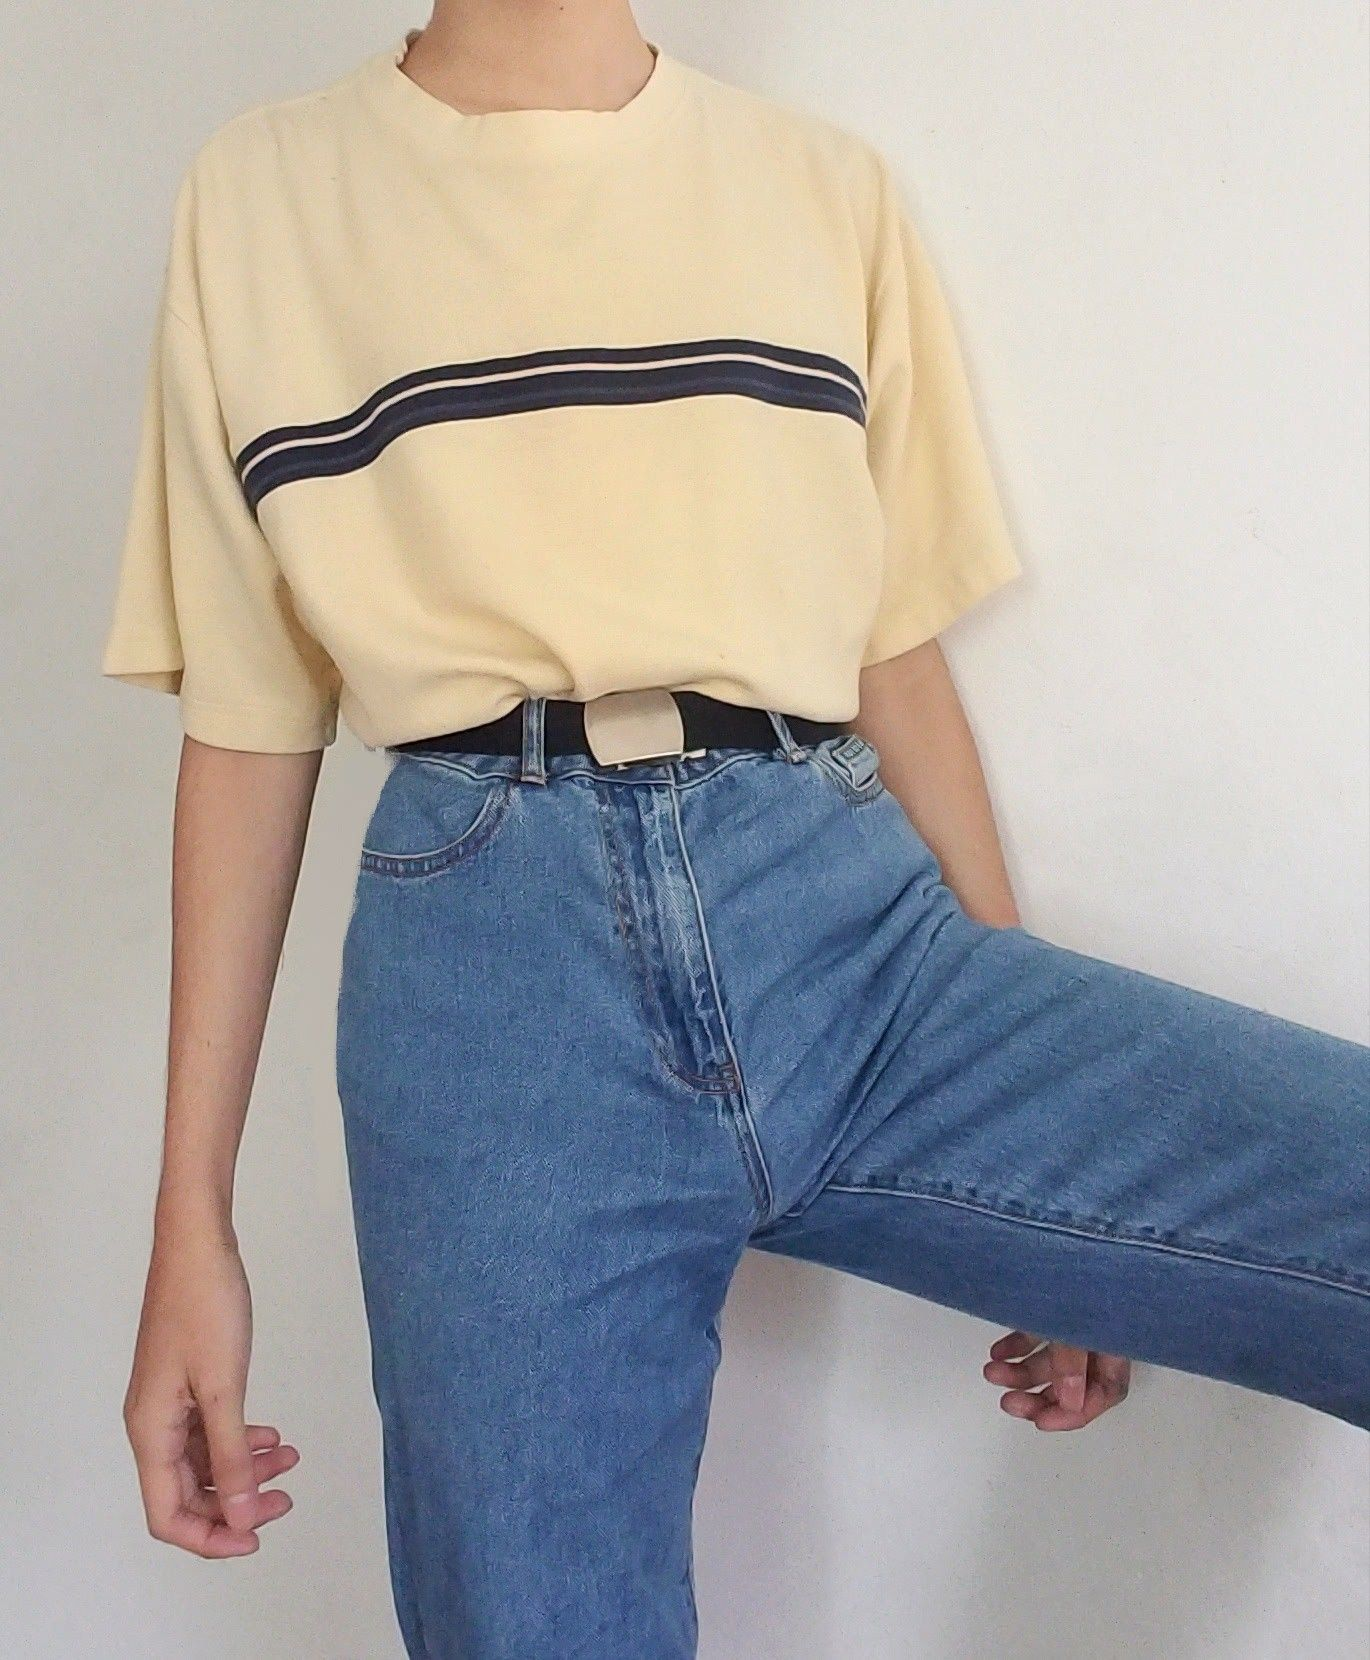 Sadwhore Retro Outfits Aesthetic Clothes